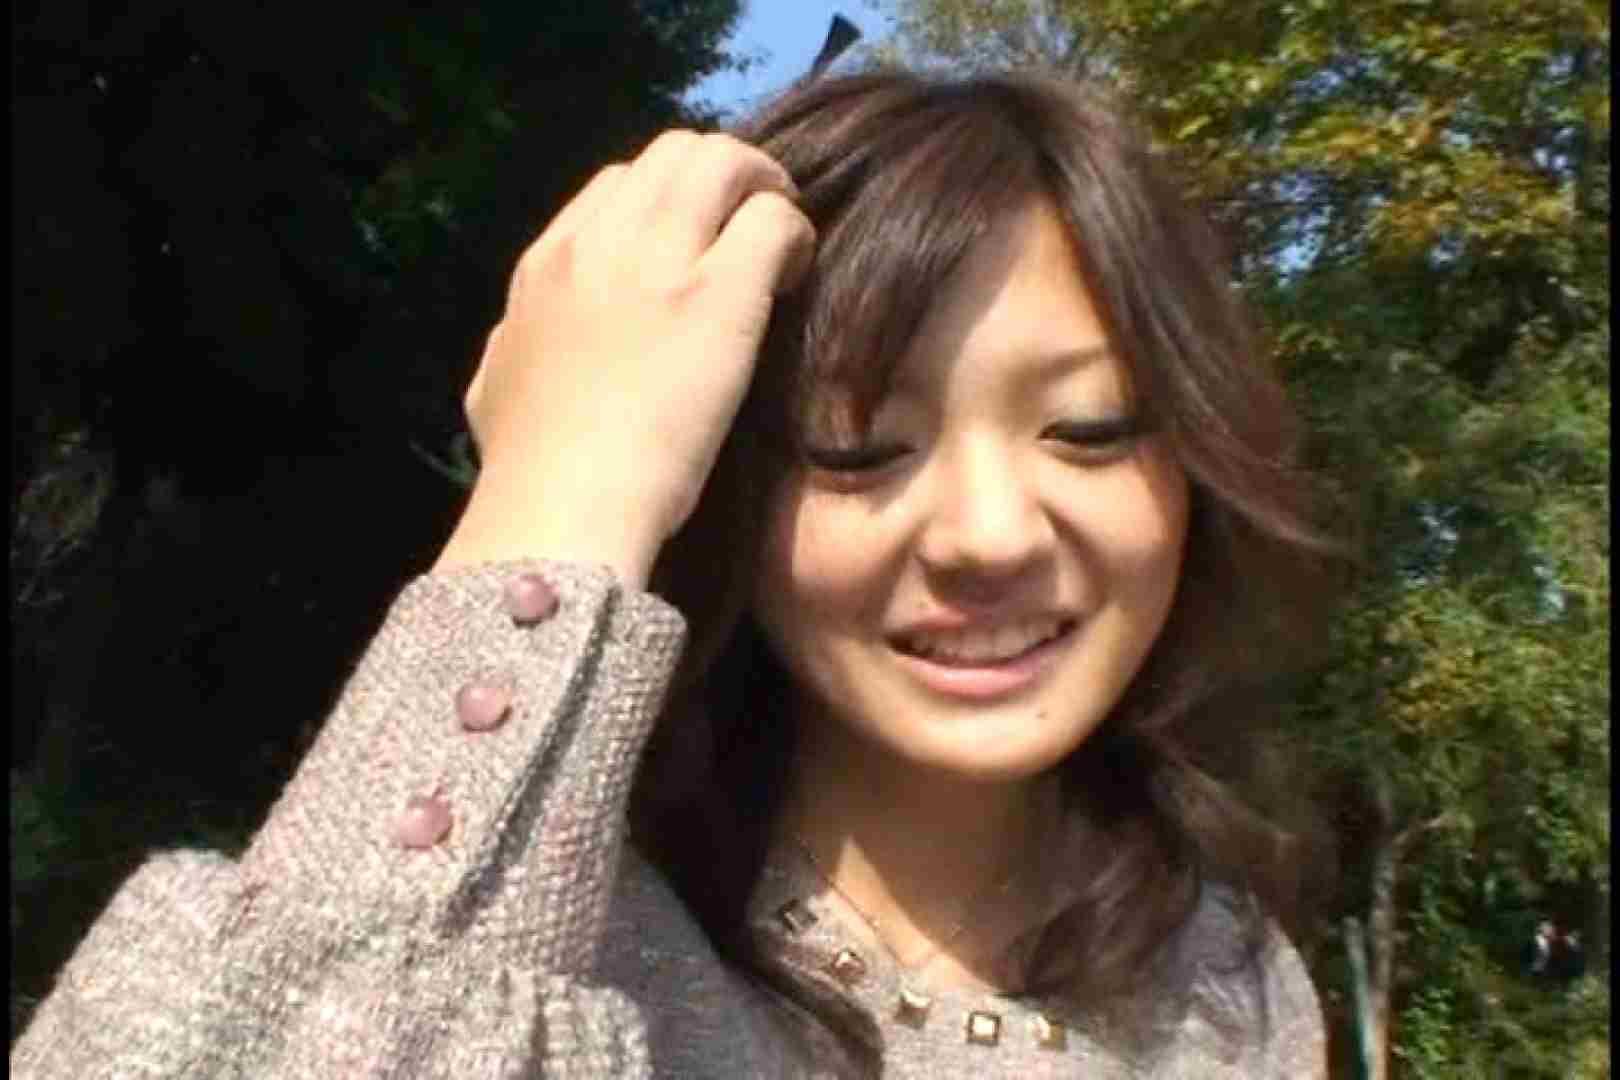 JDハンター全国ツアー vol.035 前編 女子大生のエロ動画  110PIX 32